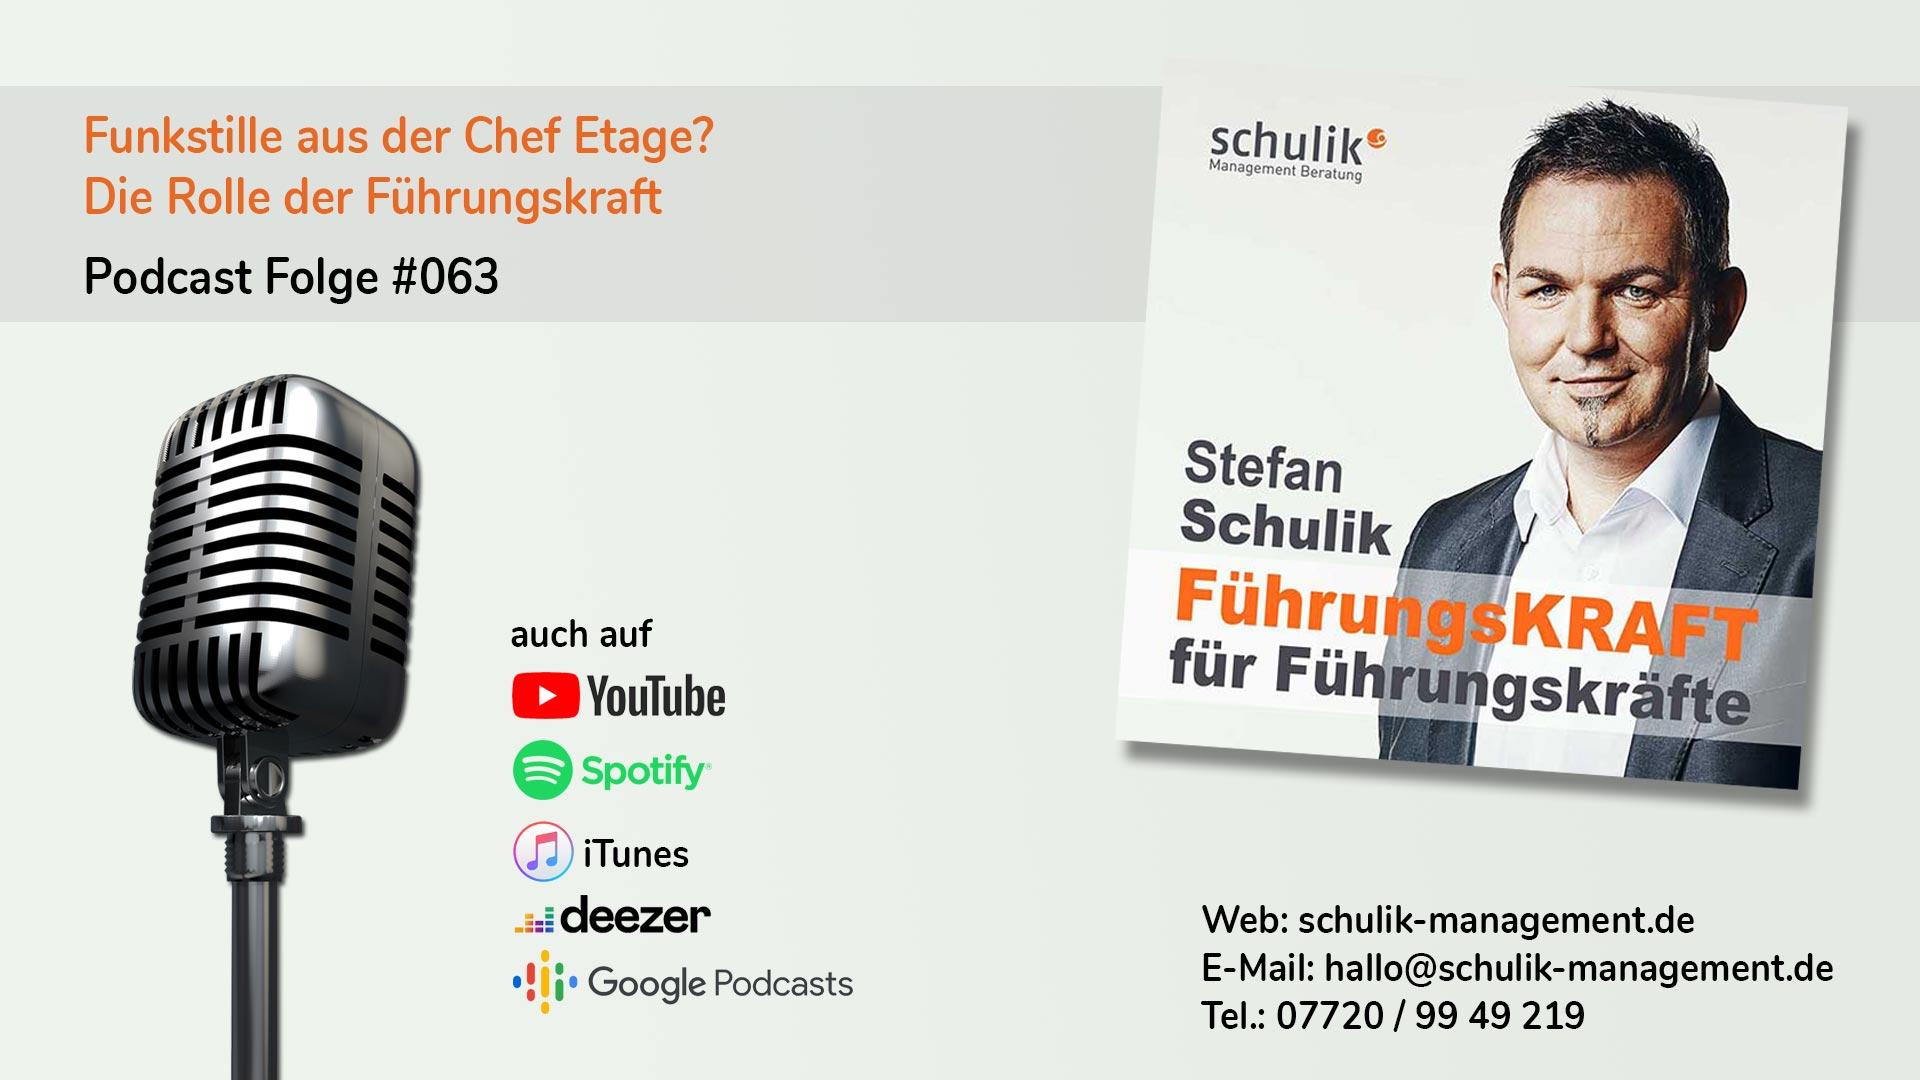 Die Rolle Der Führungskraft – Podcast Folge #063